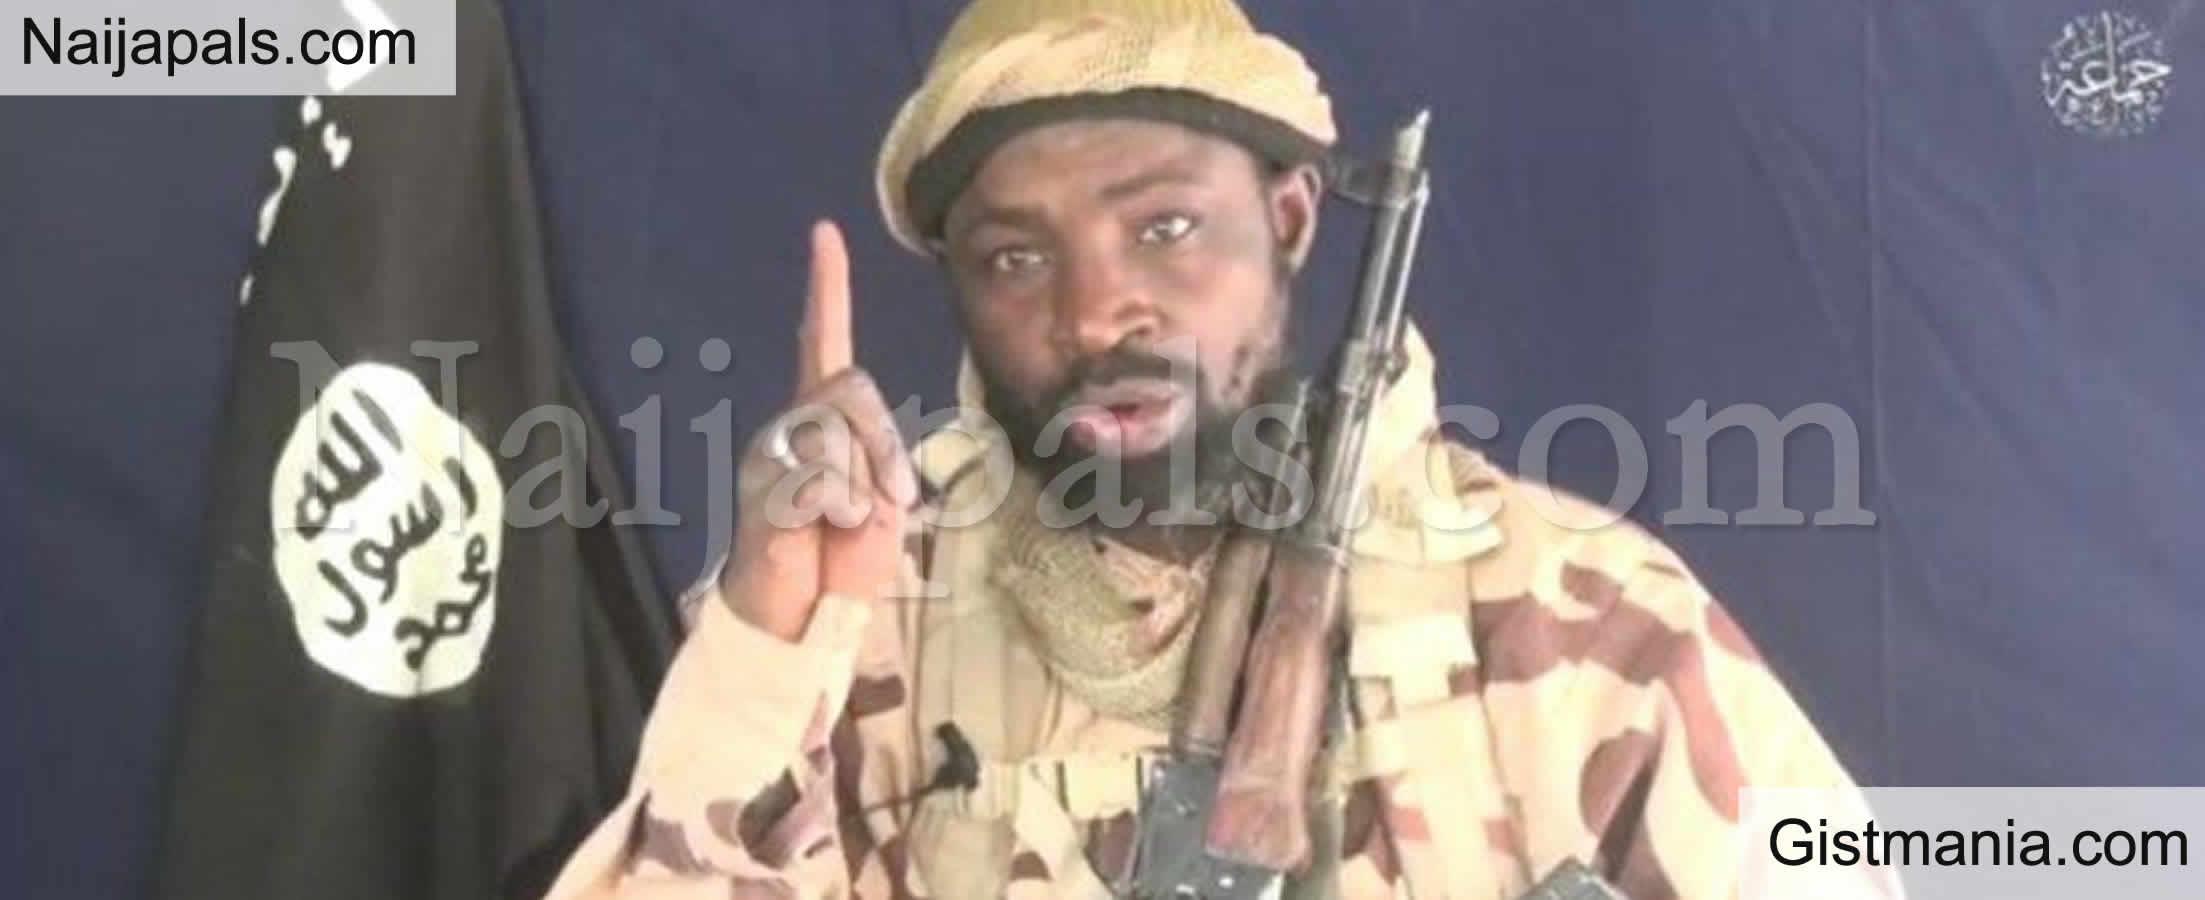 <img alt='.' class='lazyload' data-src='https://img.gistmania.com/emot/news.gif' /> <b>Boko Haram Leader, Abubakar Shekau Condemns Death Sentence Handed To Kano Singer Over Blasphemy</b>